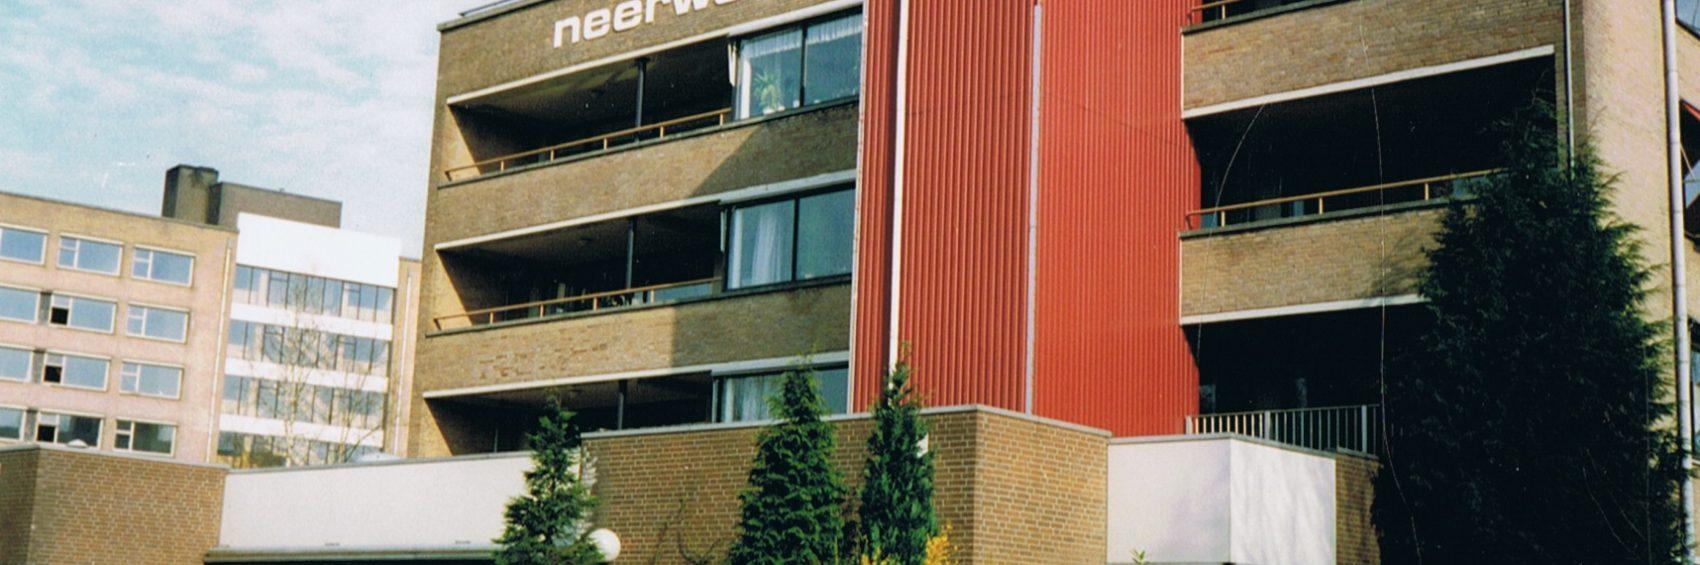 1994.20 - Heymanscentrum - Neerwolde - 1994